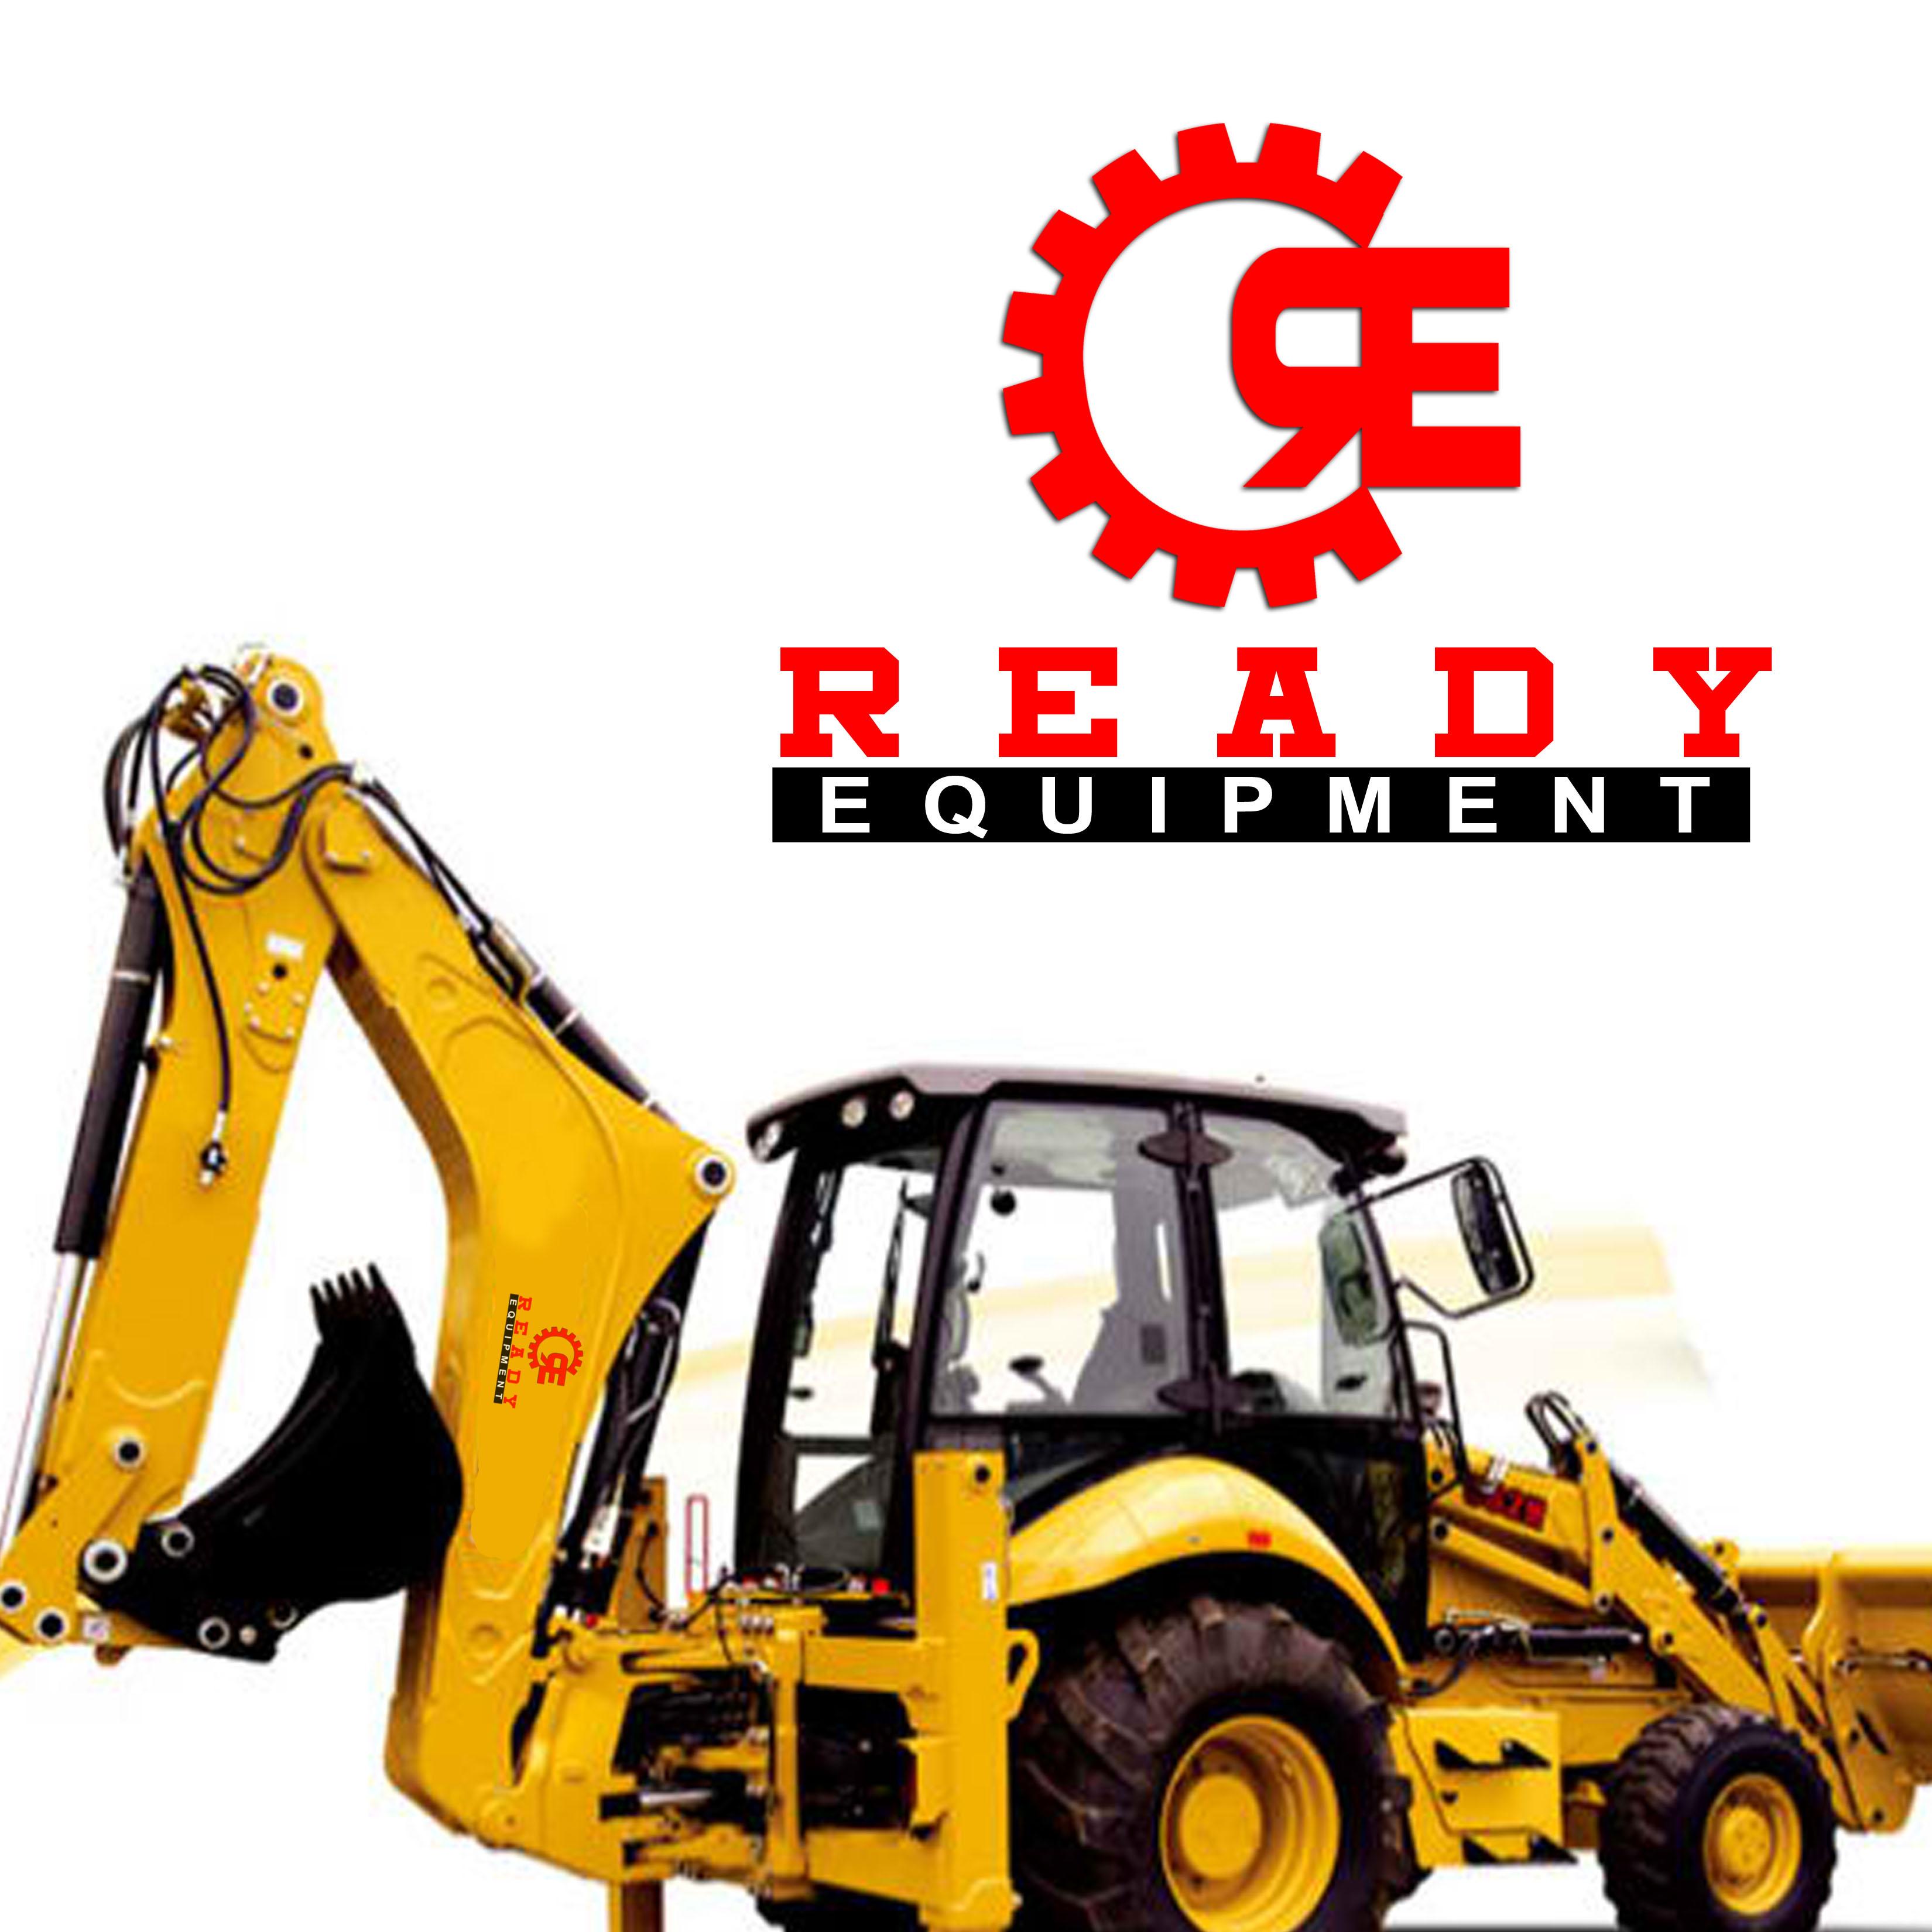 Logo Design by Allan Esclamado - Entry No. 143 in the Logo Design Contest Ready Equipment  Logo Design.